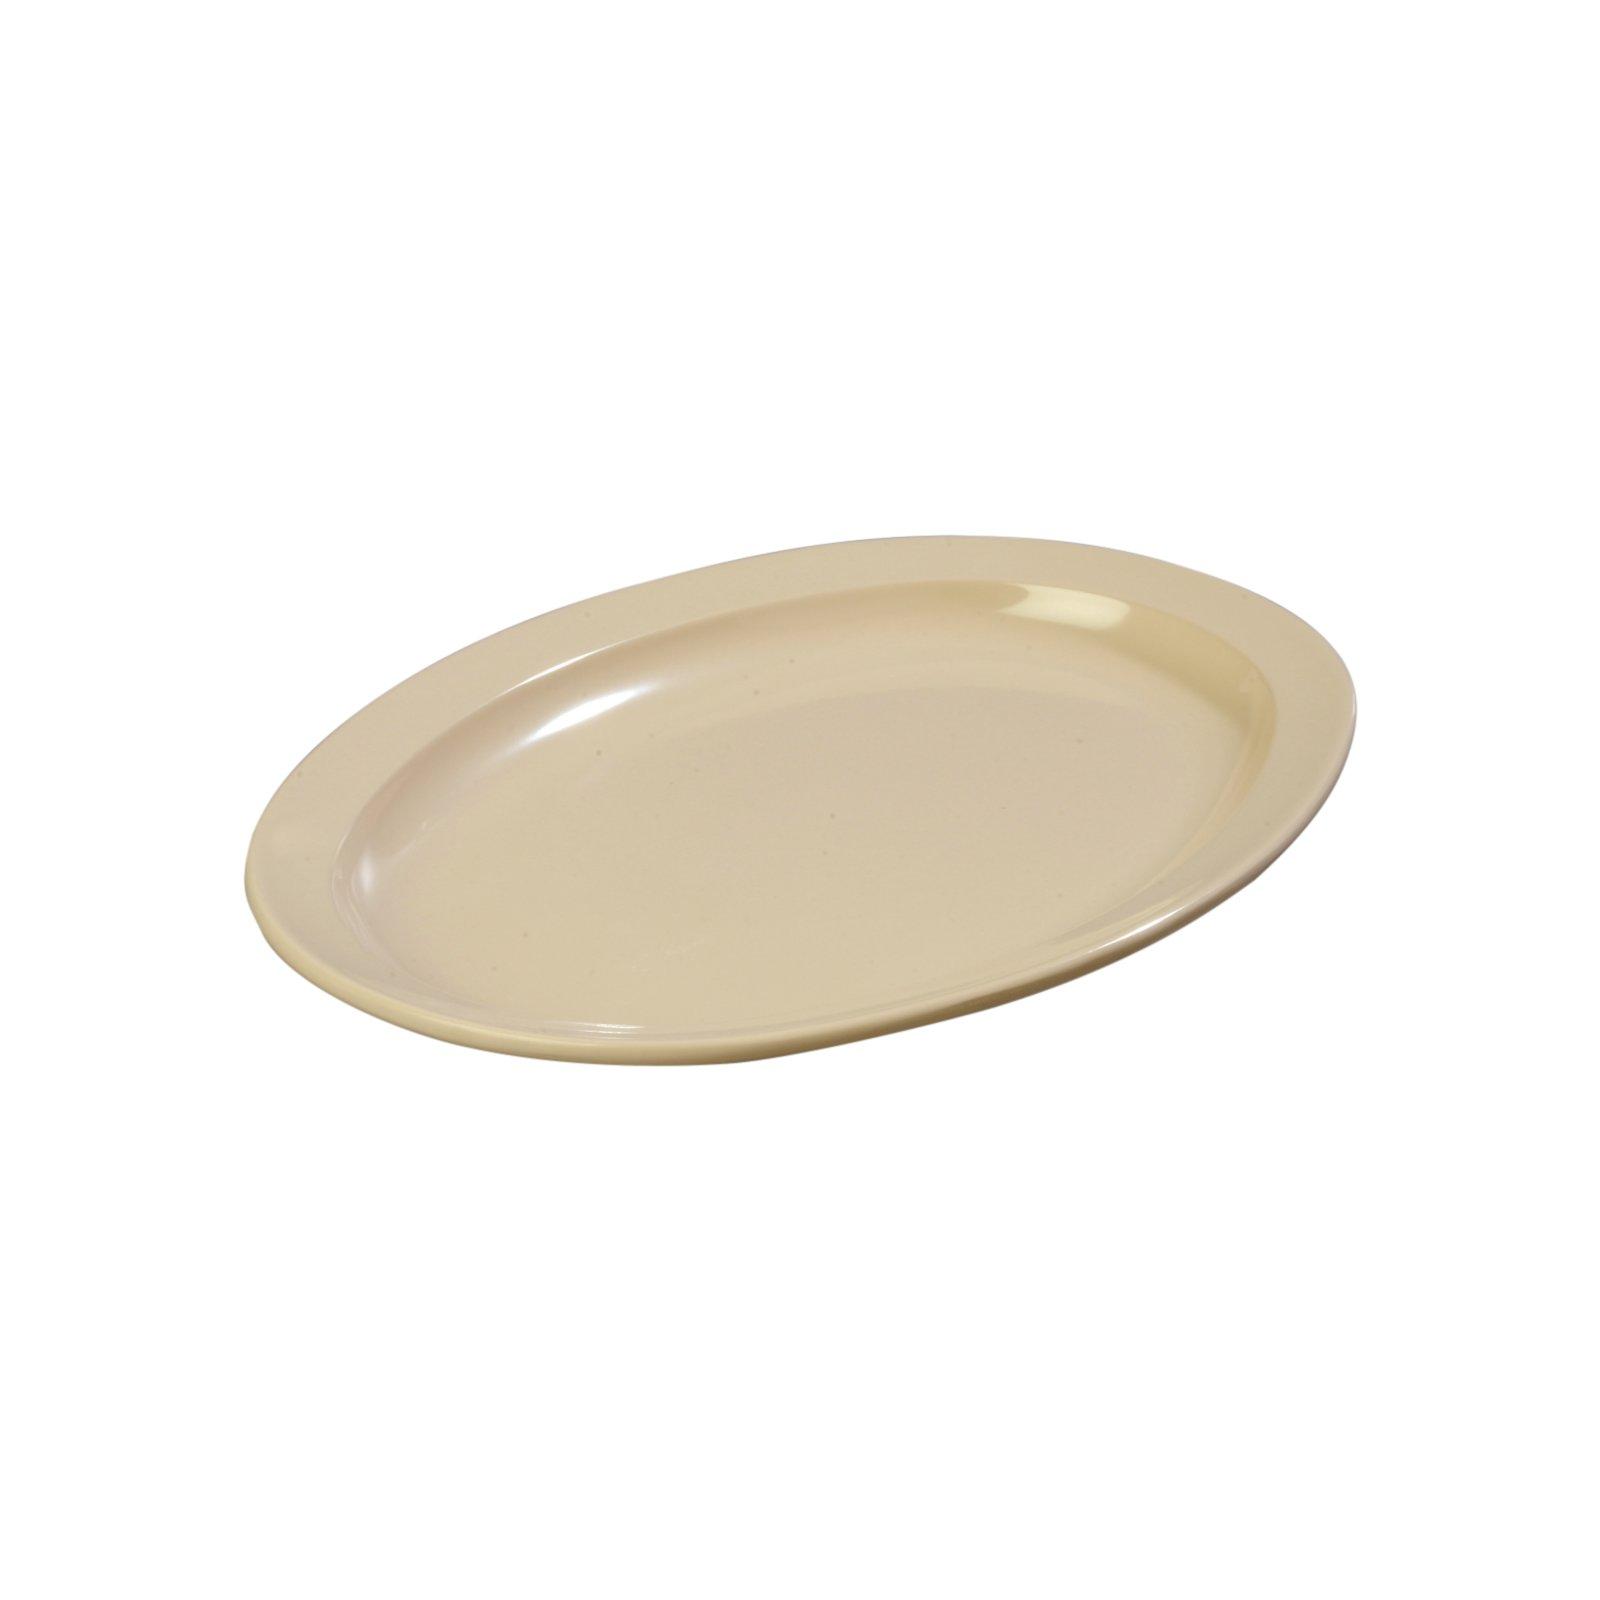 KL12625 - Kingline™ Melamine Oval Platter Tray 13.5\